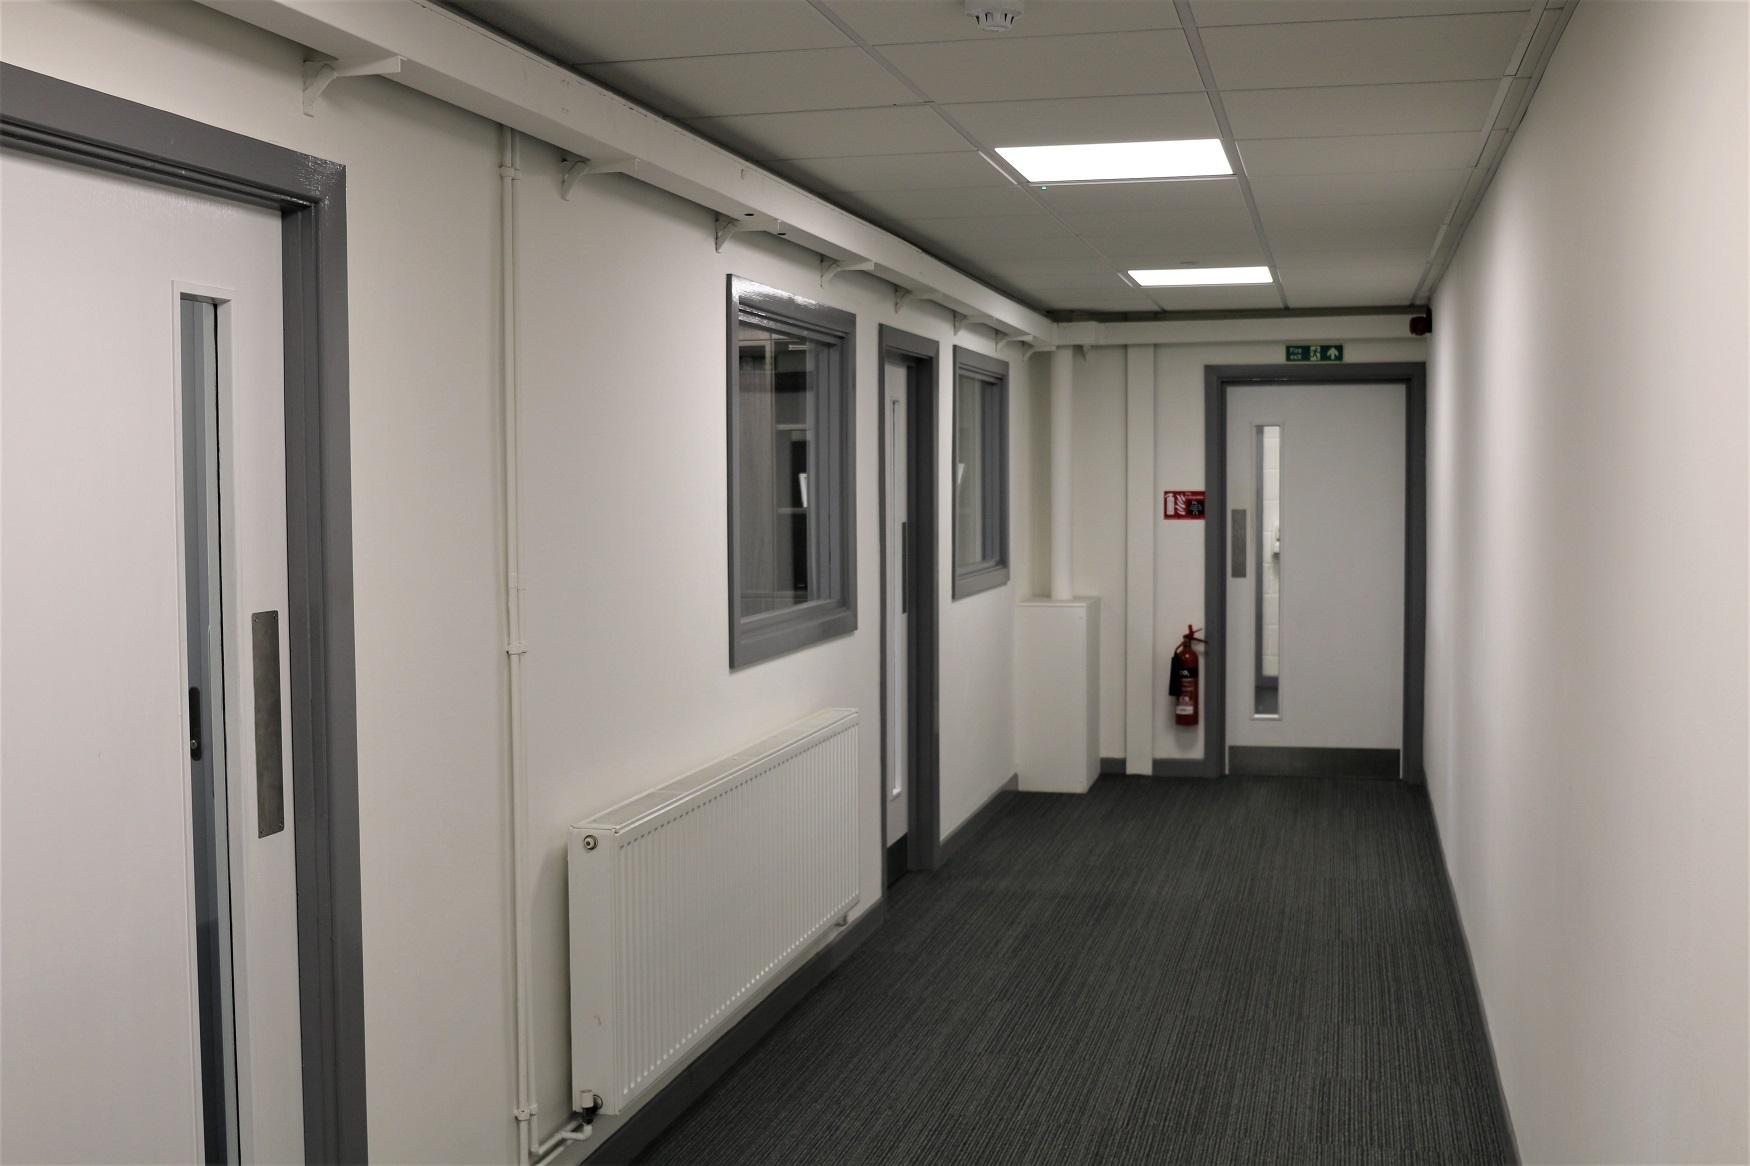 Refreshed hallways, toilets and locker area